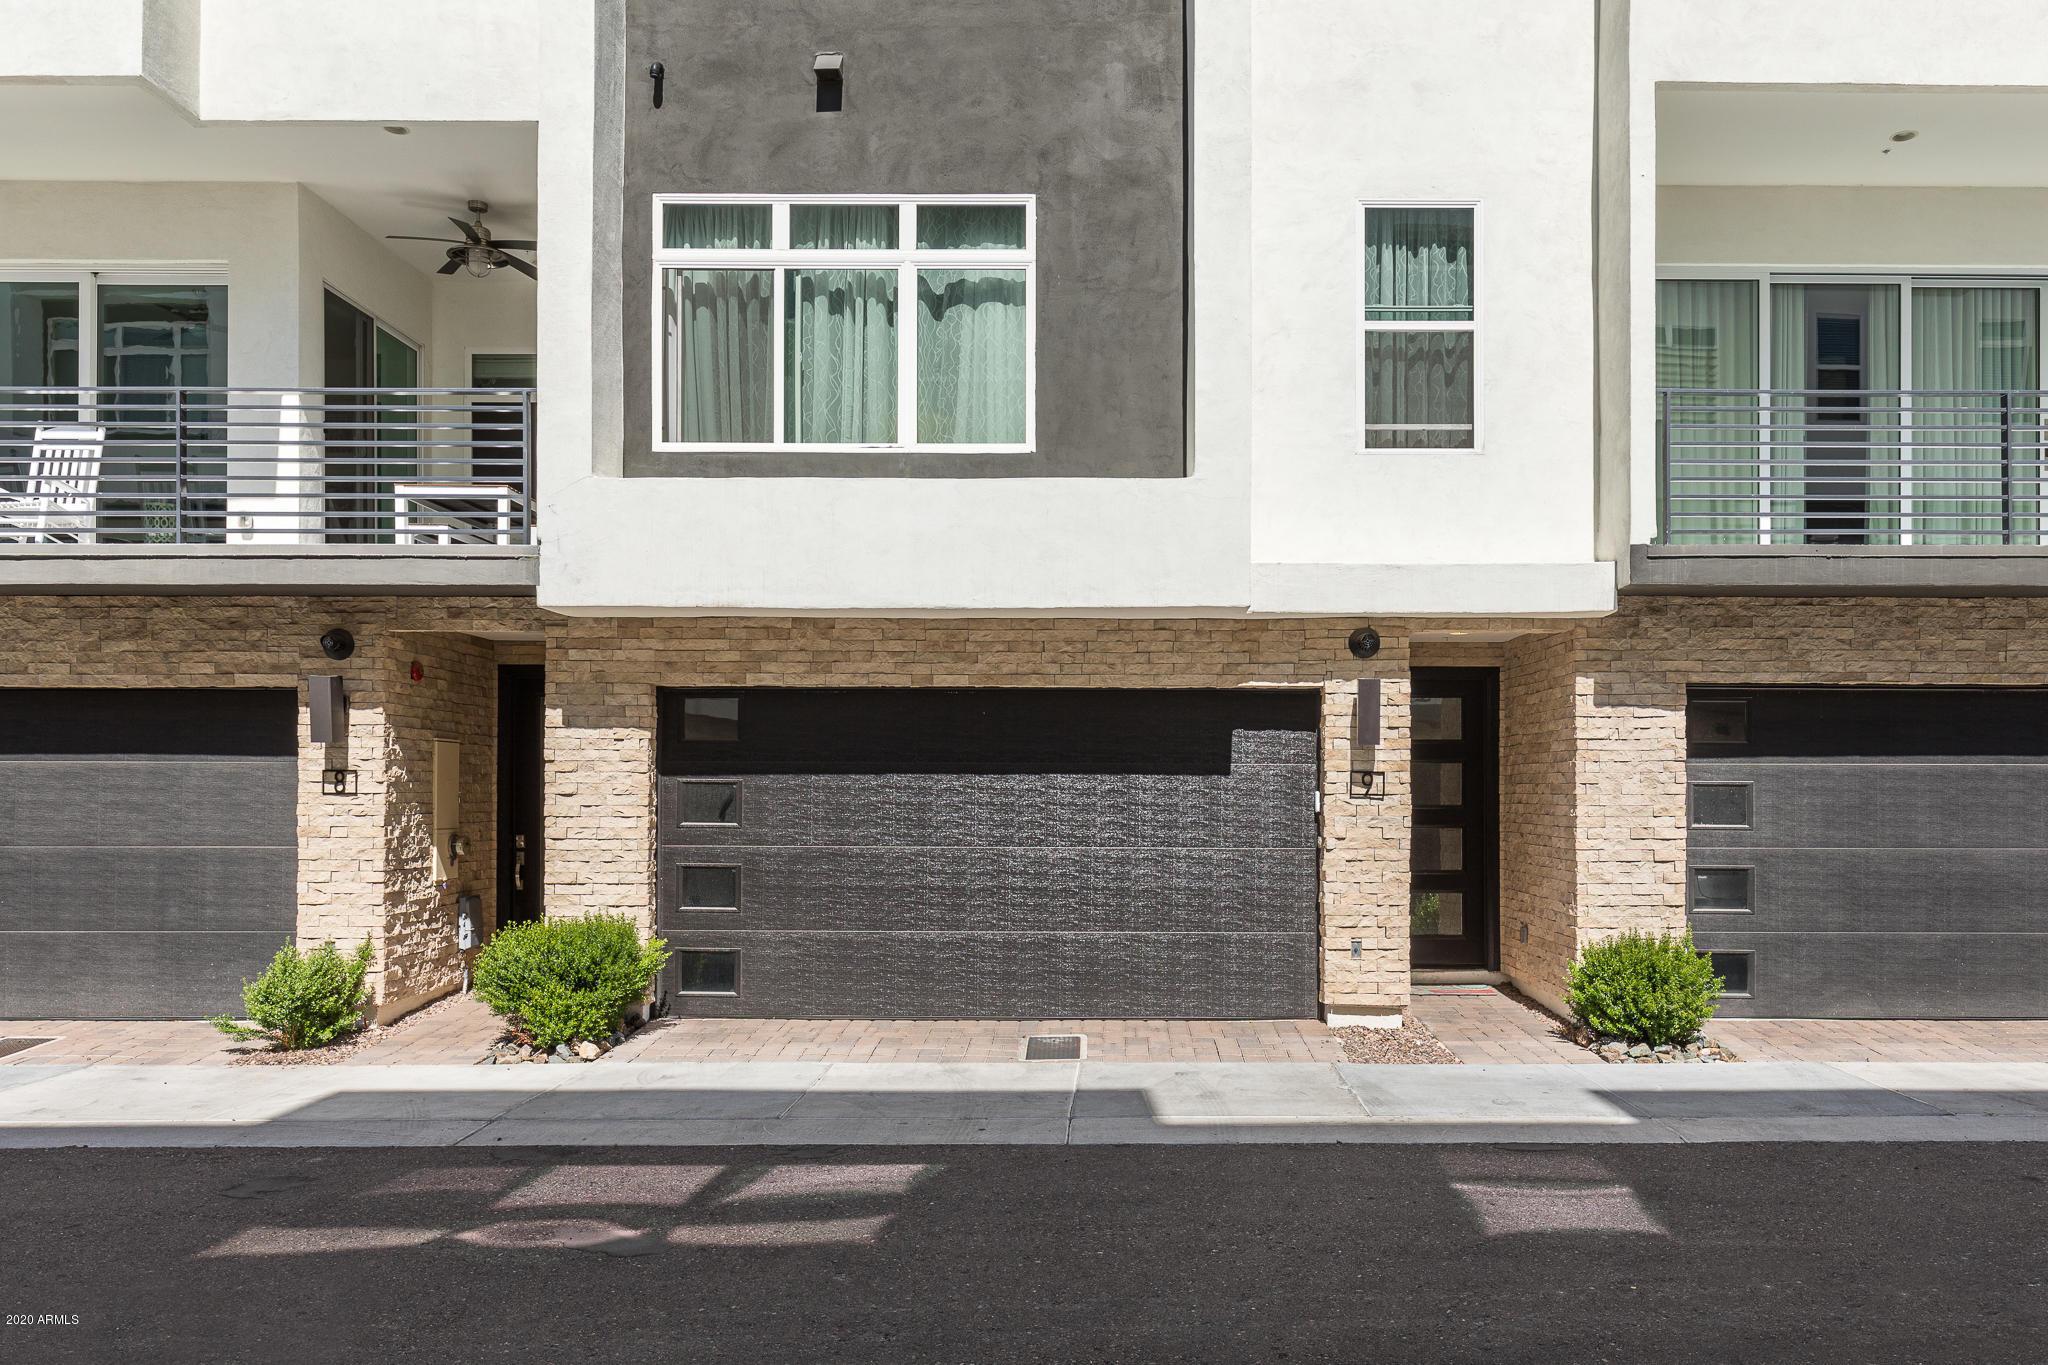 MLS 6095466 Phoenix Metro Area, Phoenix, AZ 85020 Newer Homes in Phoenix